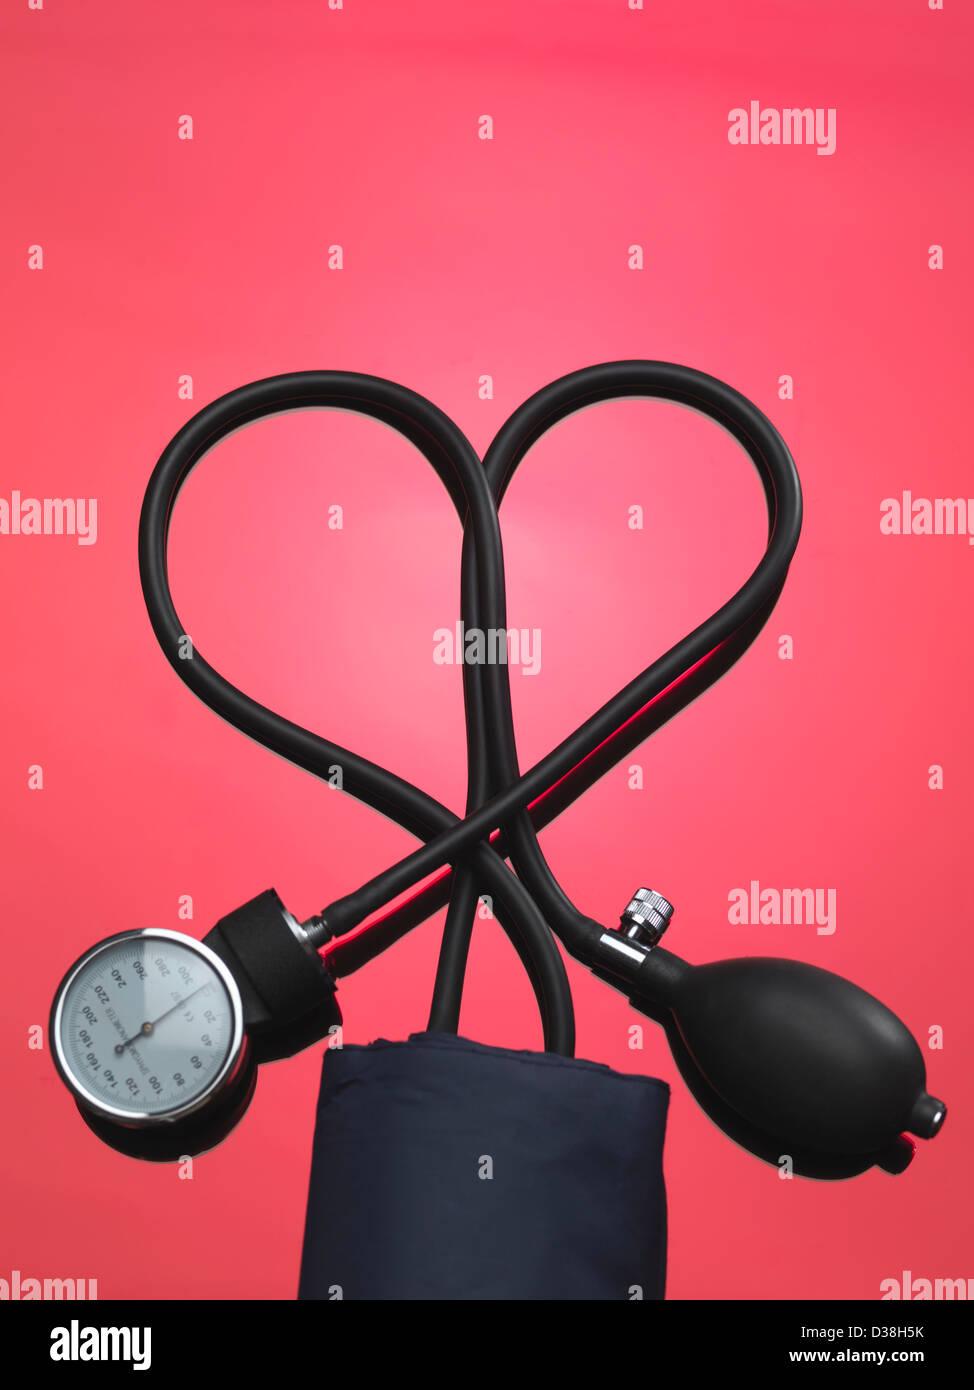 Blood pressure gauge in heart shape - Stock Image